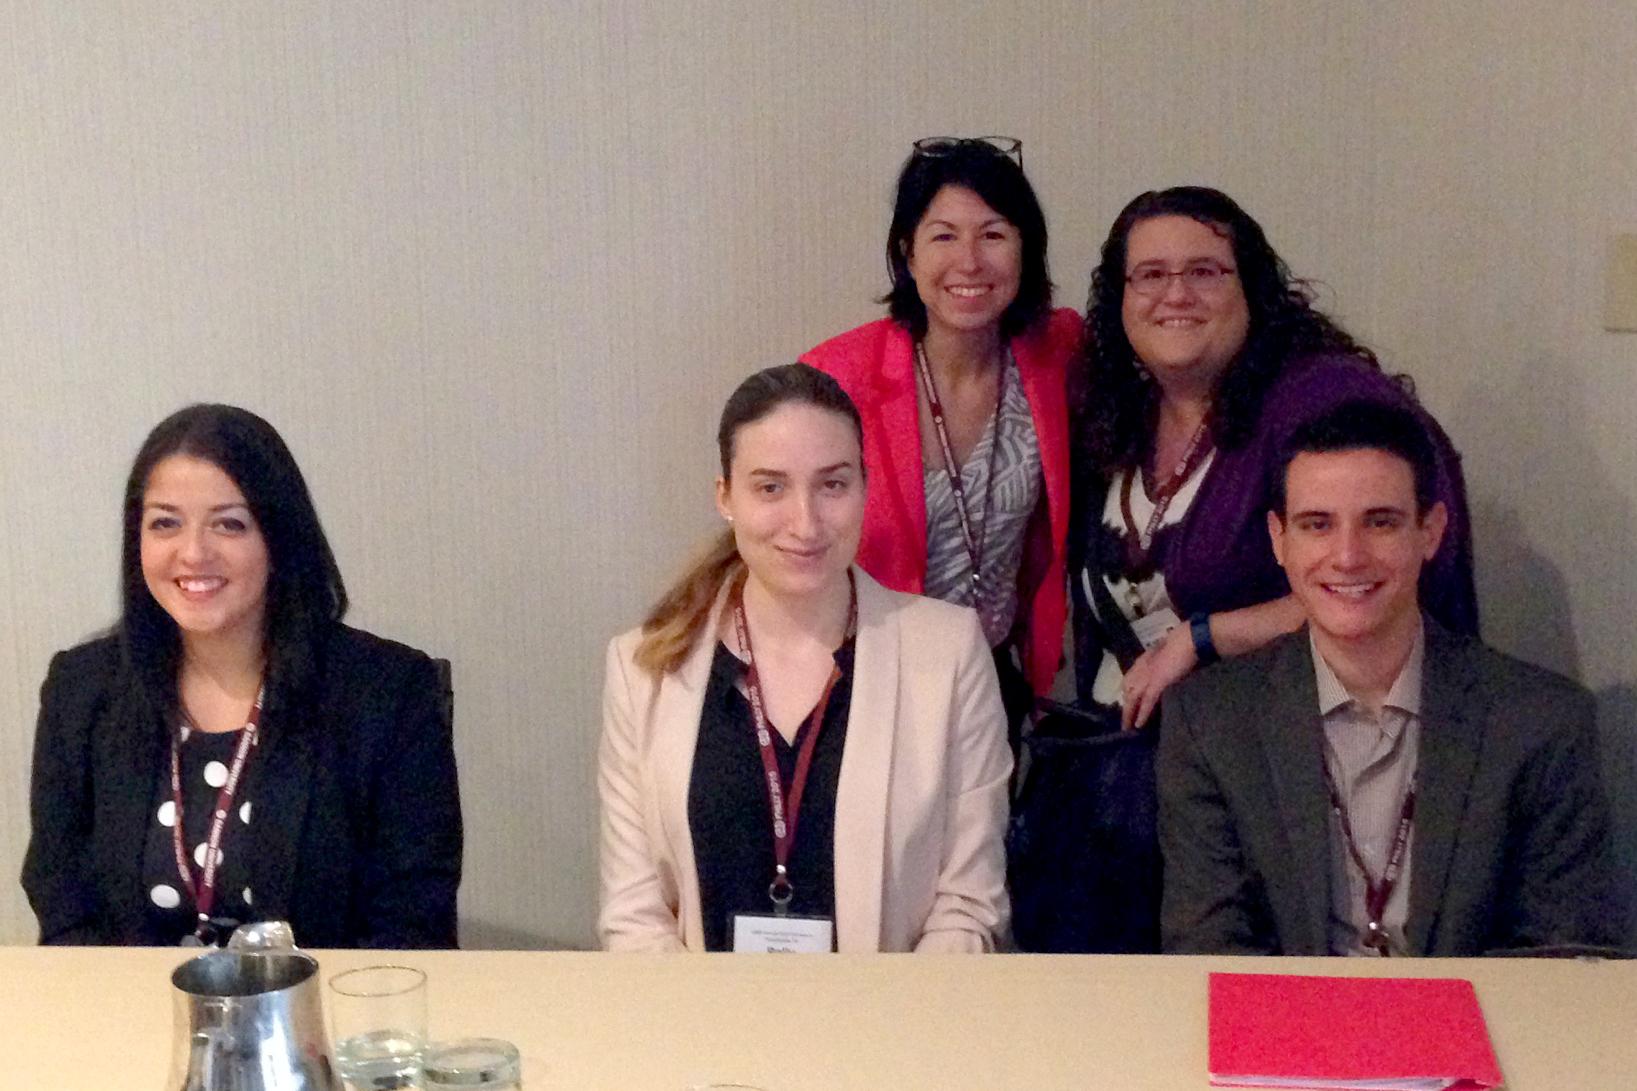 Front from left Zoe Escandon (Ashland University), Parisa Bruce '17, Kevin Anglim '16. Back: Prof.. Kim Field-Springer (Ashland University), Prof. Katie Margavio Striley (UNC Chapel Hill).